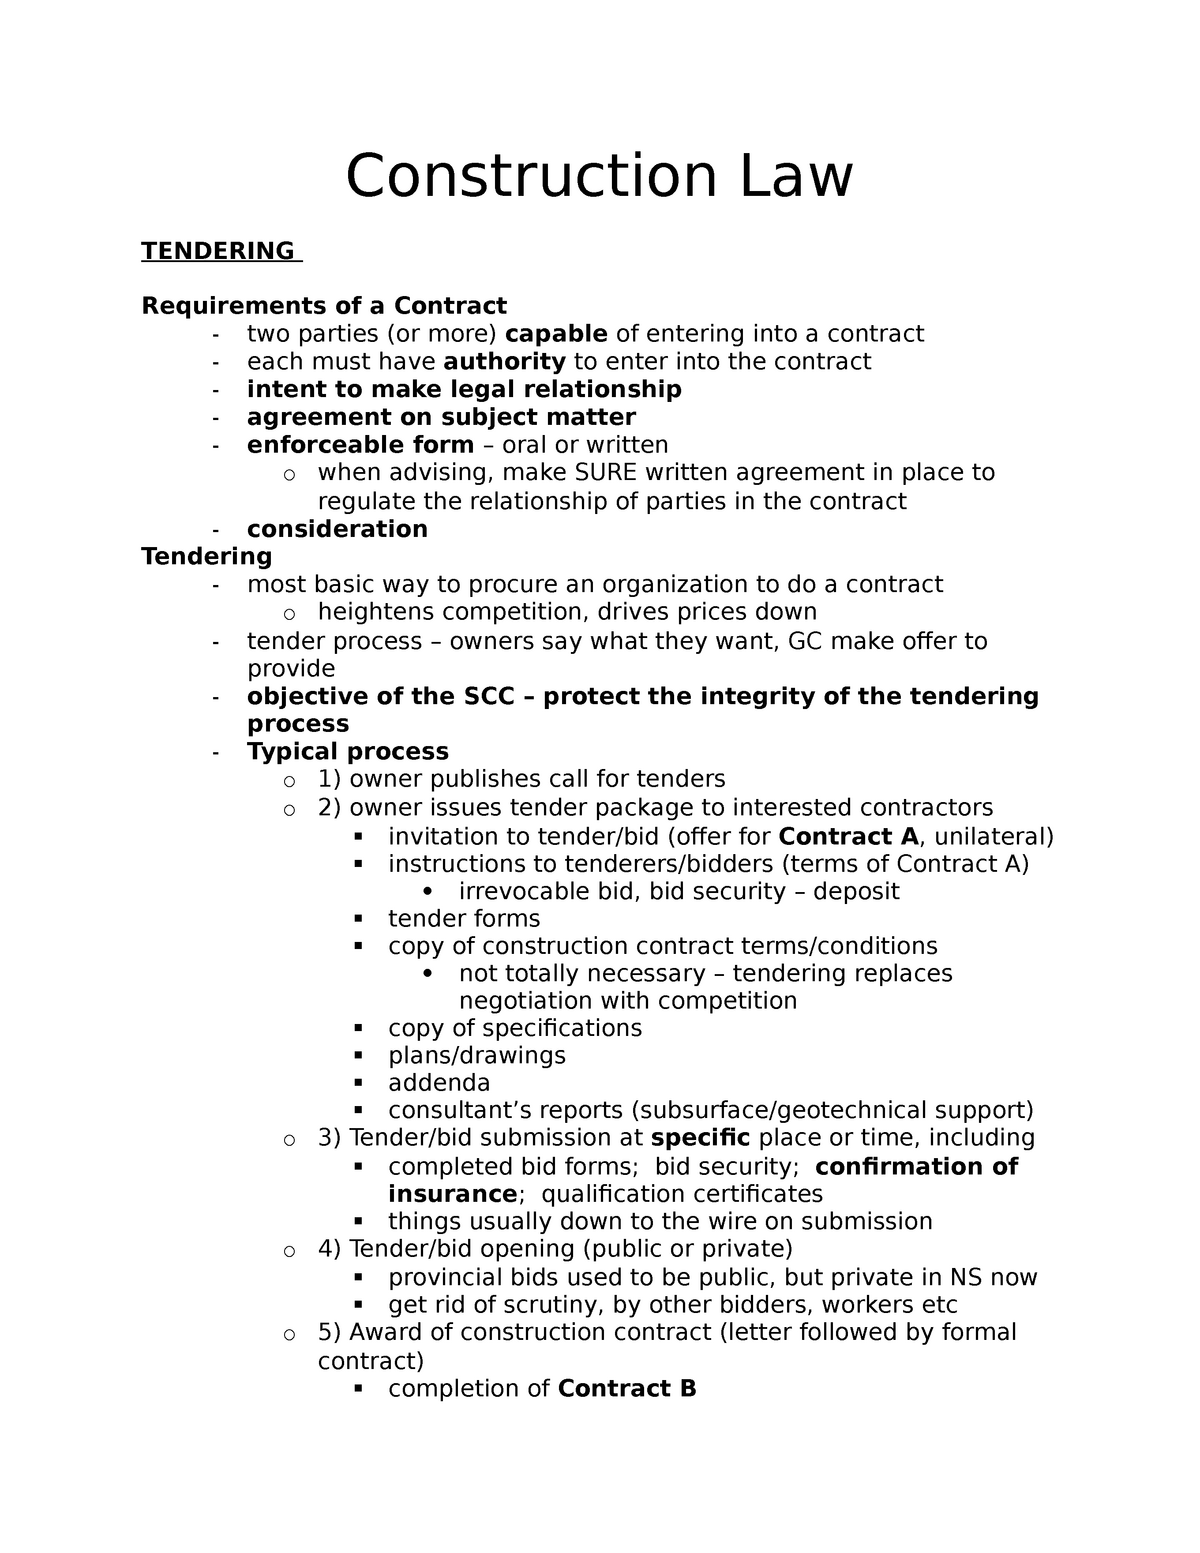 Construction Law-2015-Gibson - LAWS 2218 - Dal - StuDocu